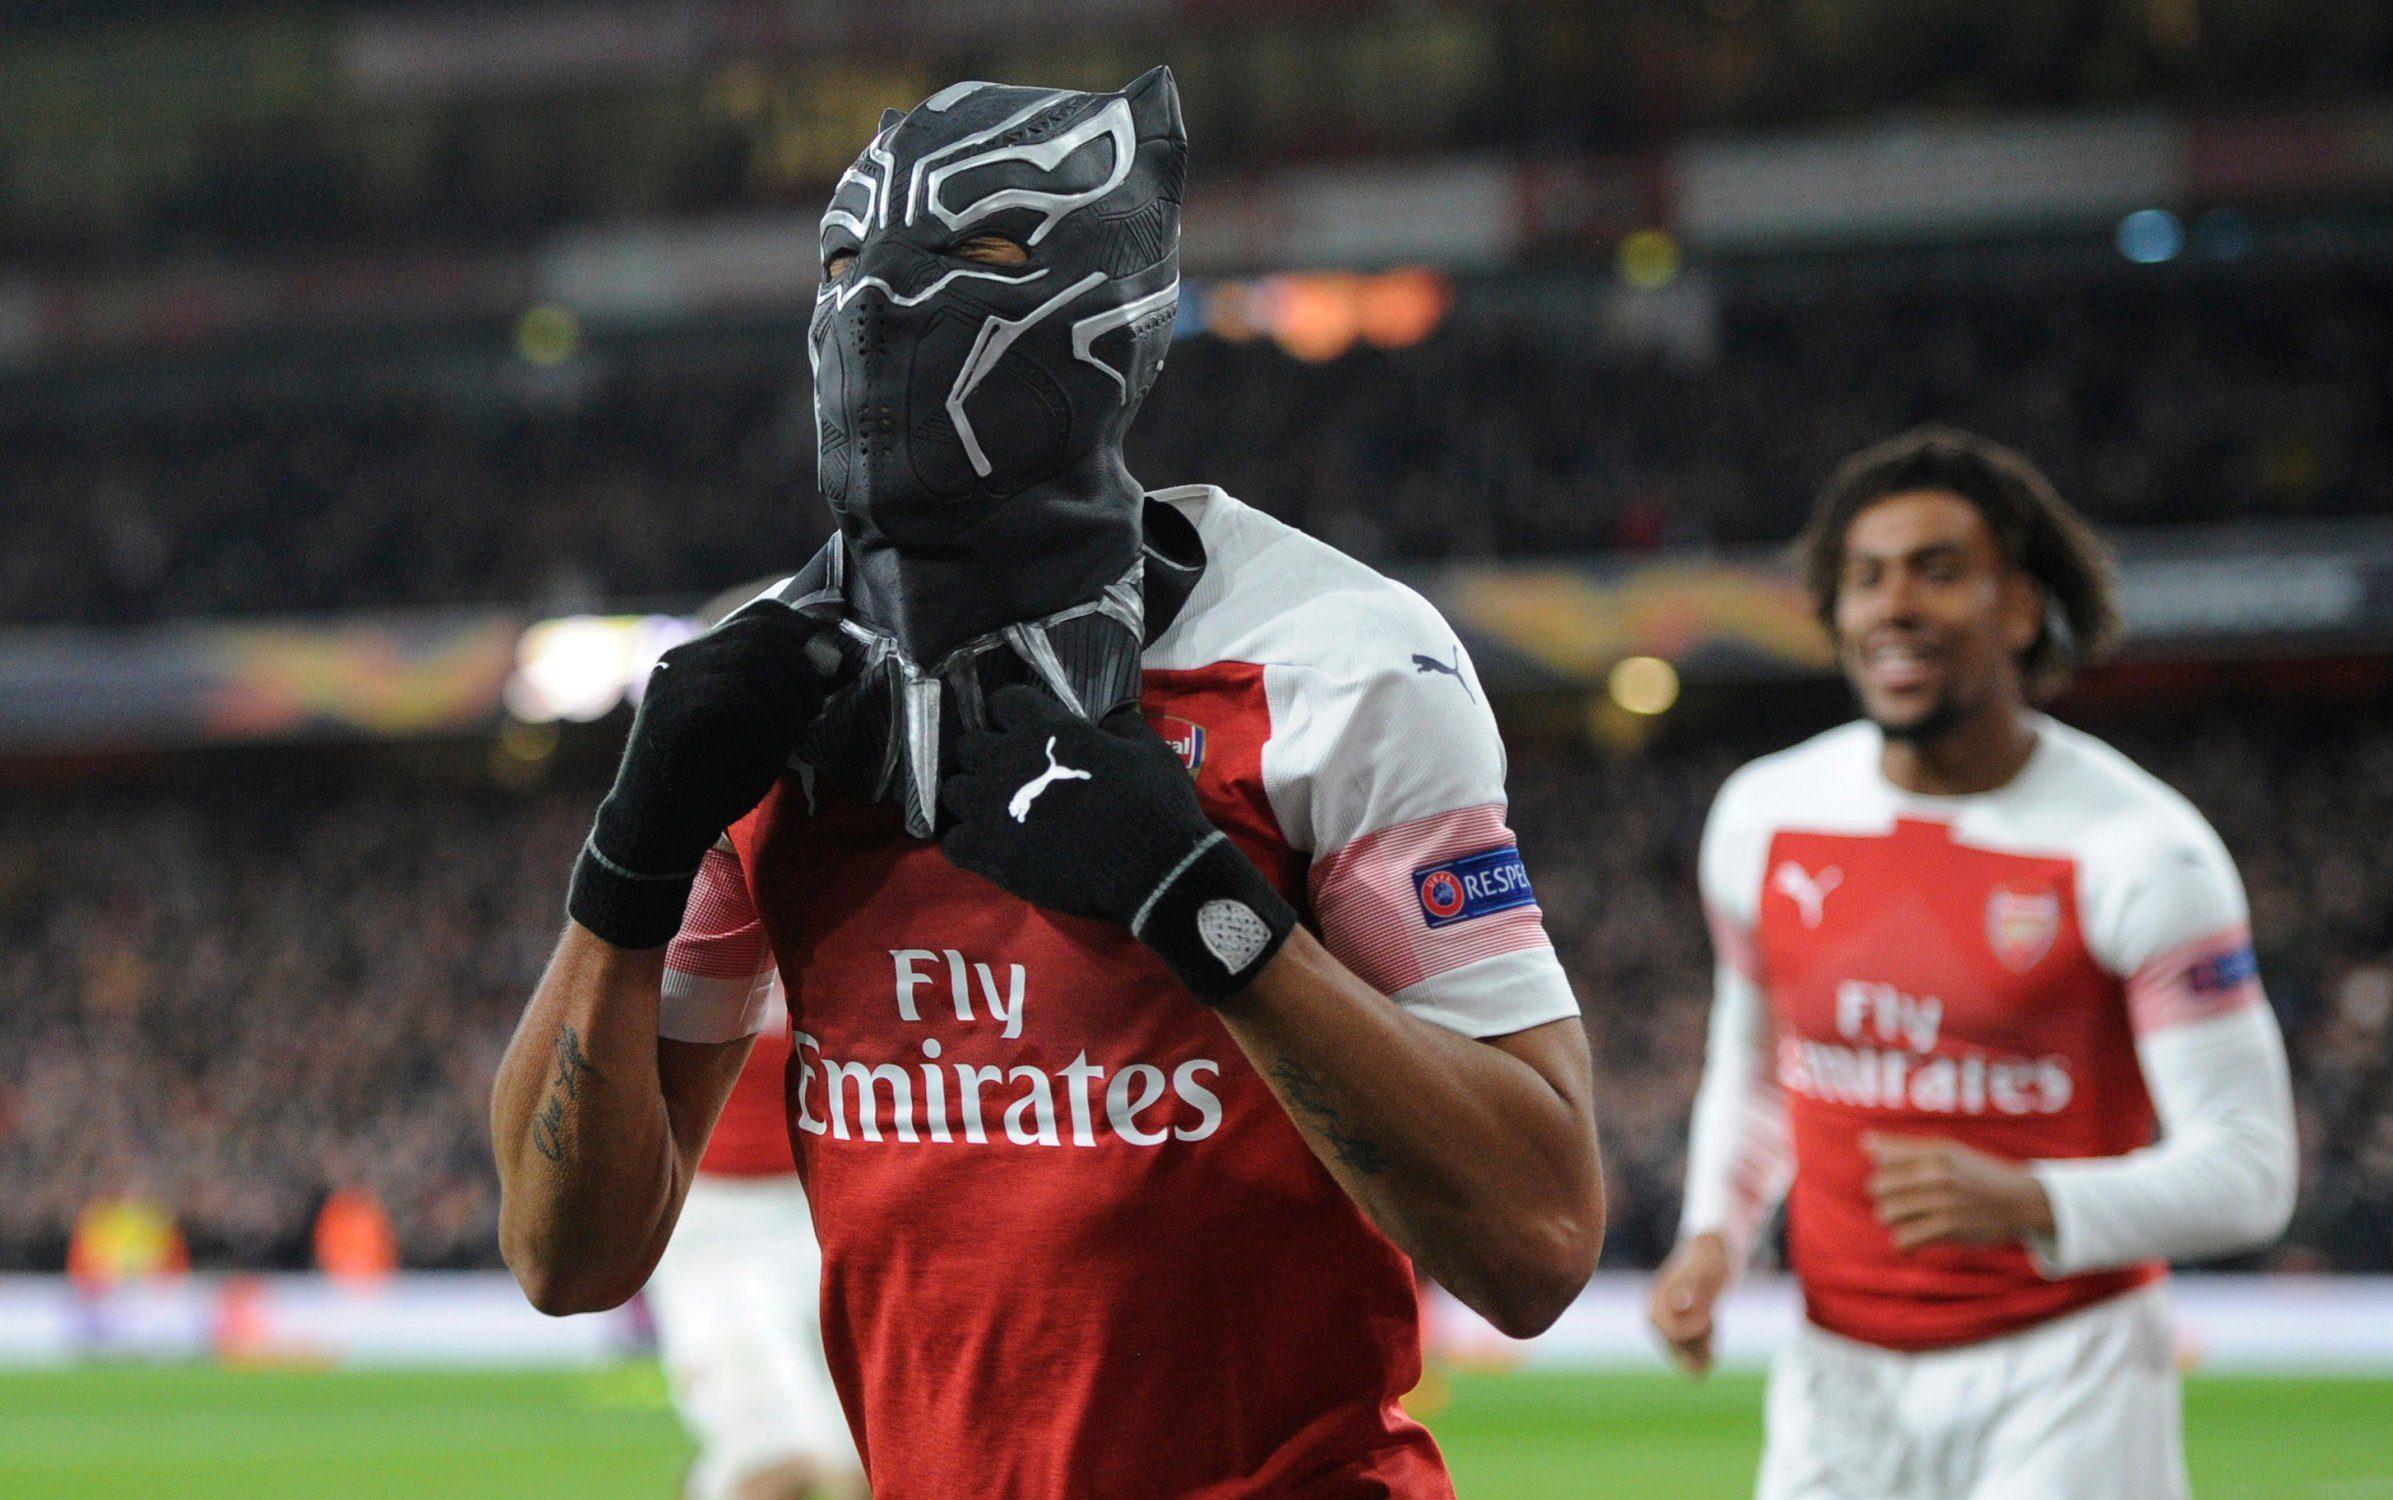 Arsenal star Pierre-Emerick Aubameyang booked for Black Panther celebration